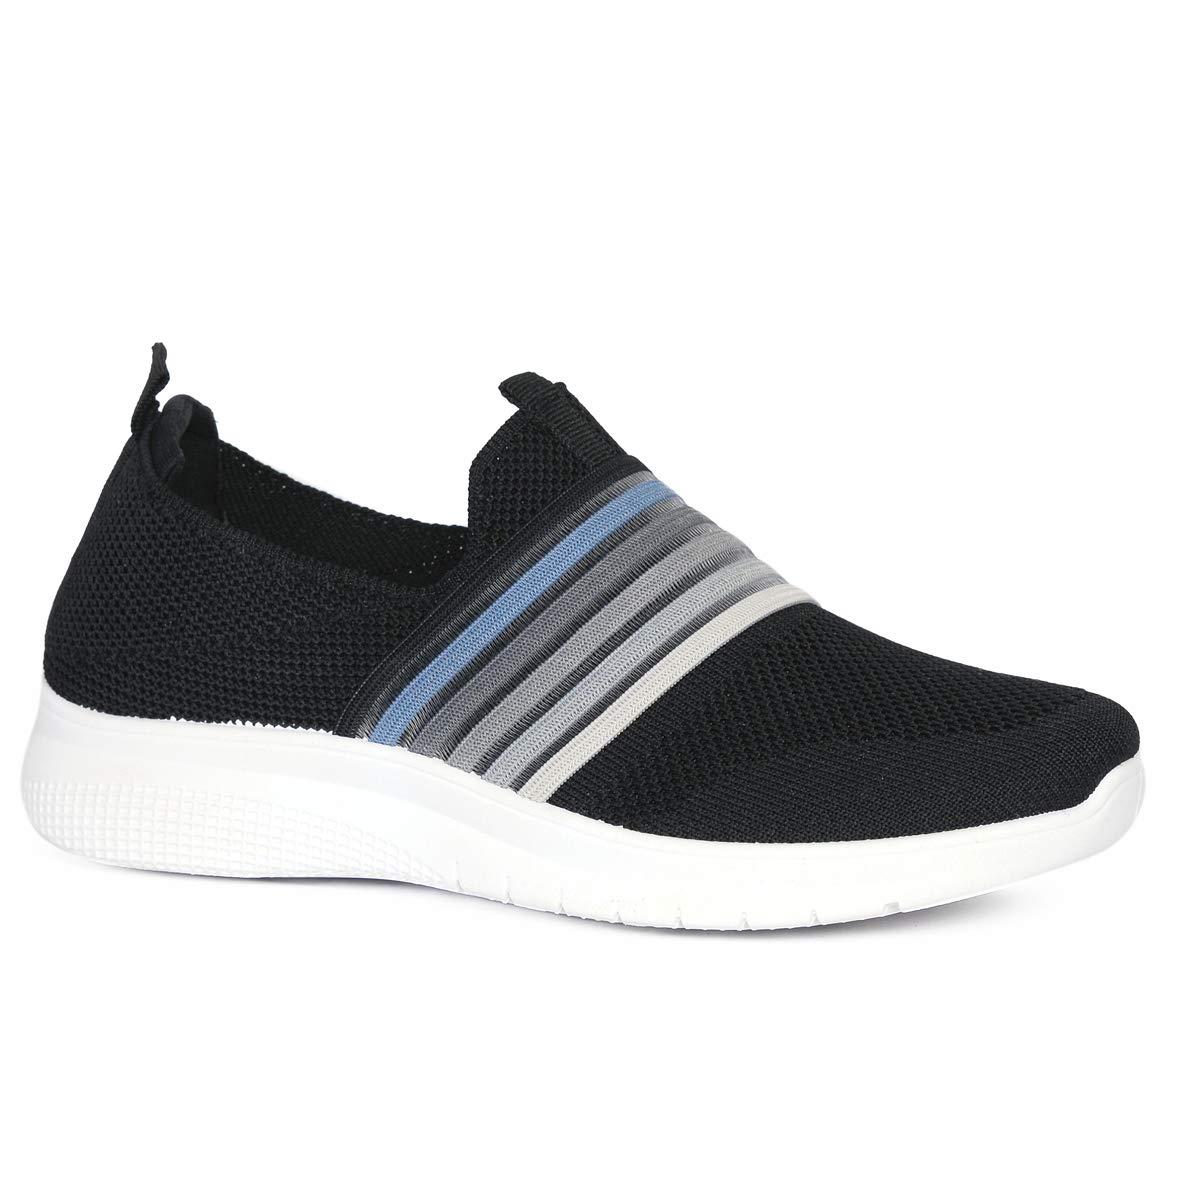 black slip on walking shoes